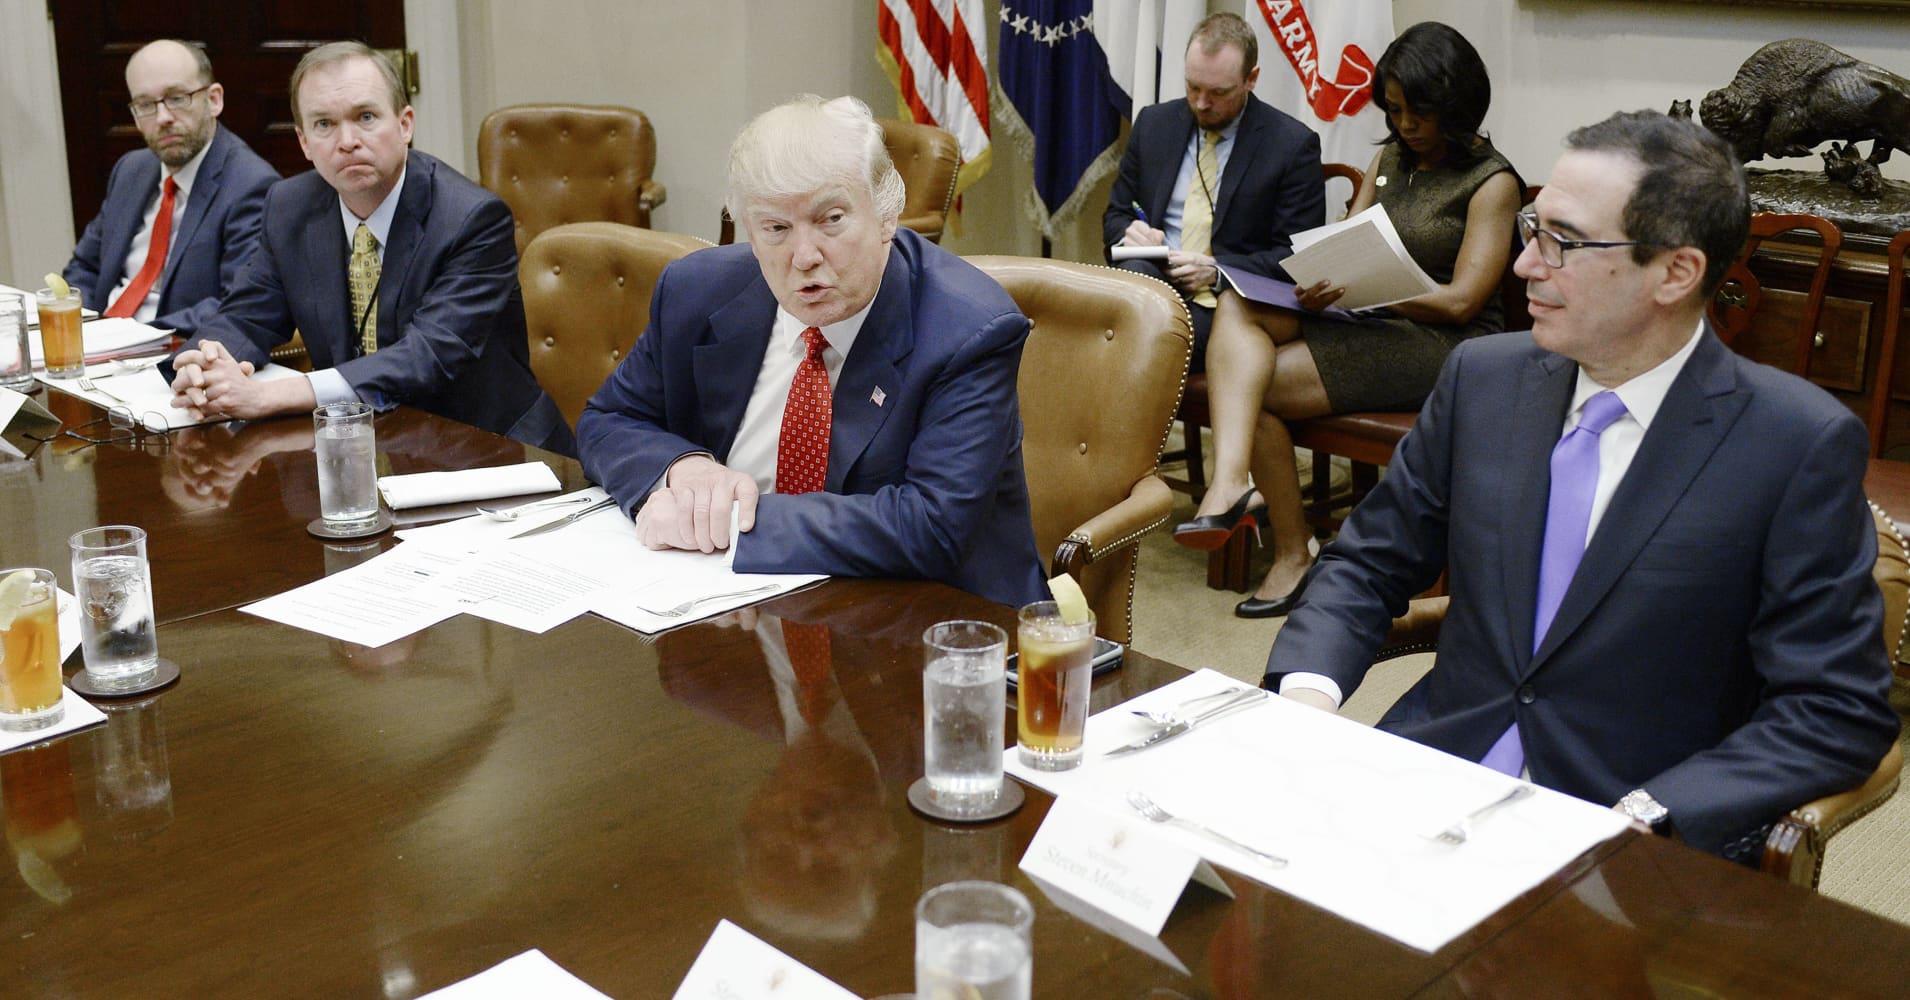 Trump's budget proposal adds a 'new definition to la-la land,' Democrat Max Baucus says